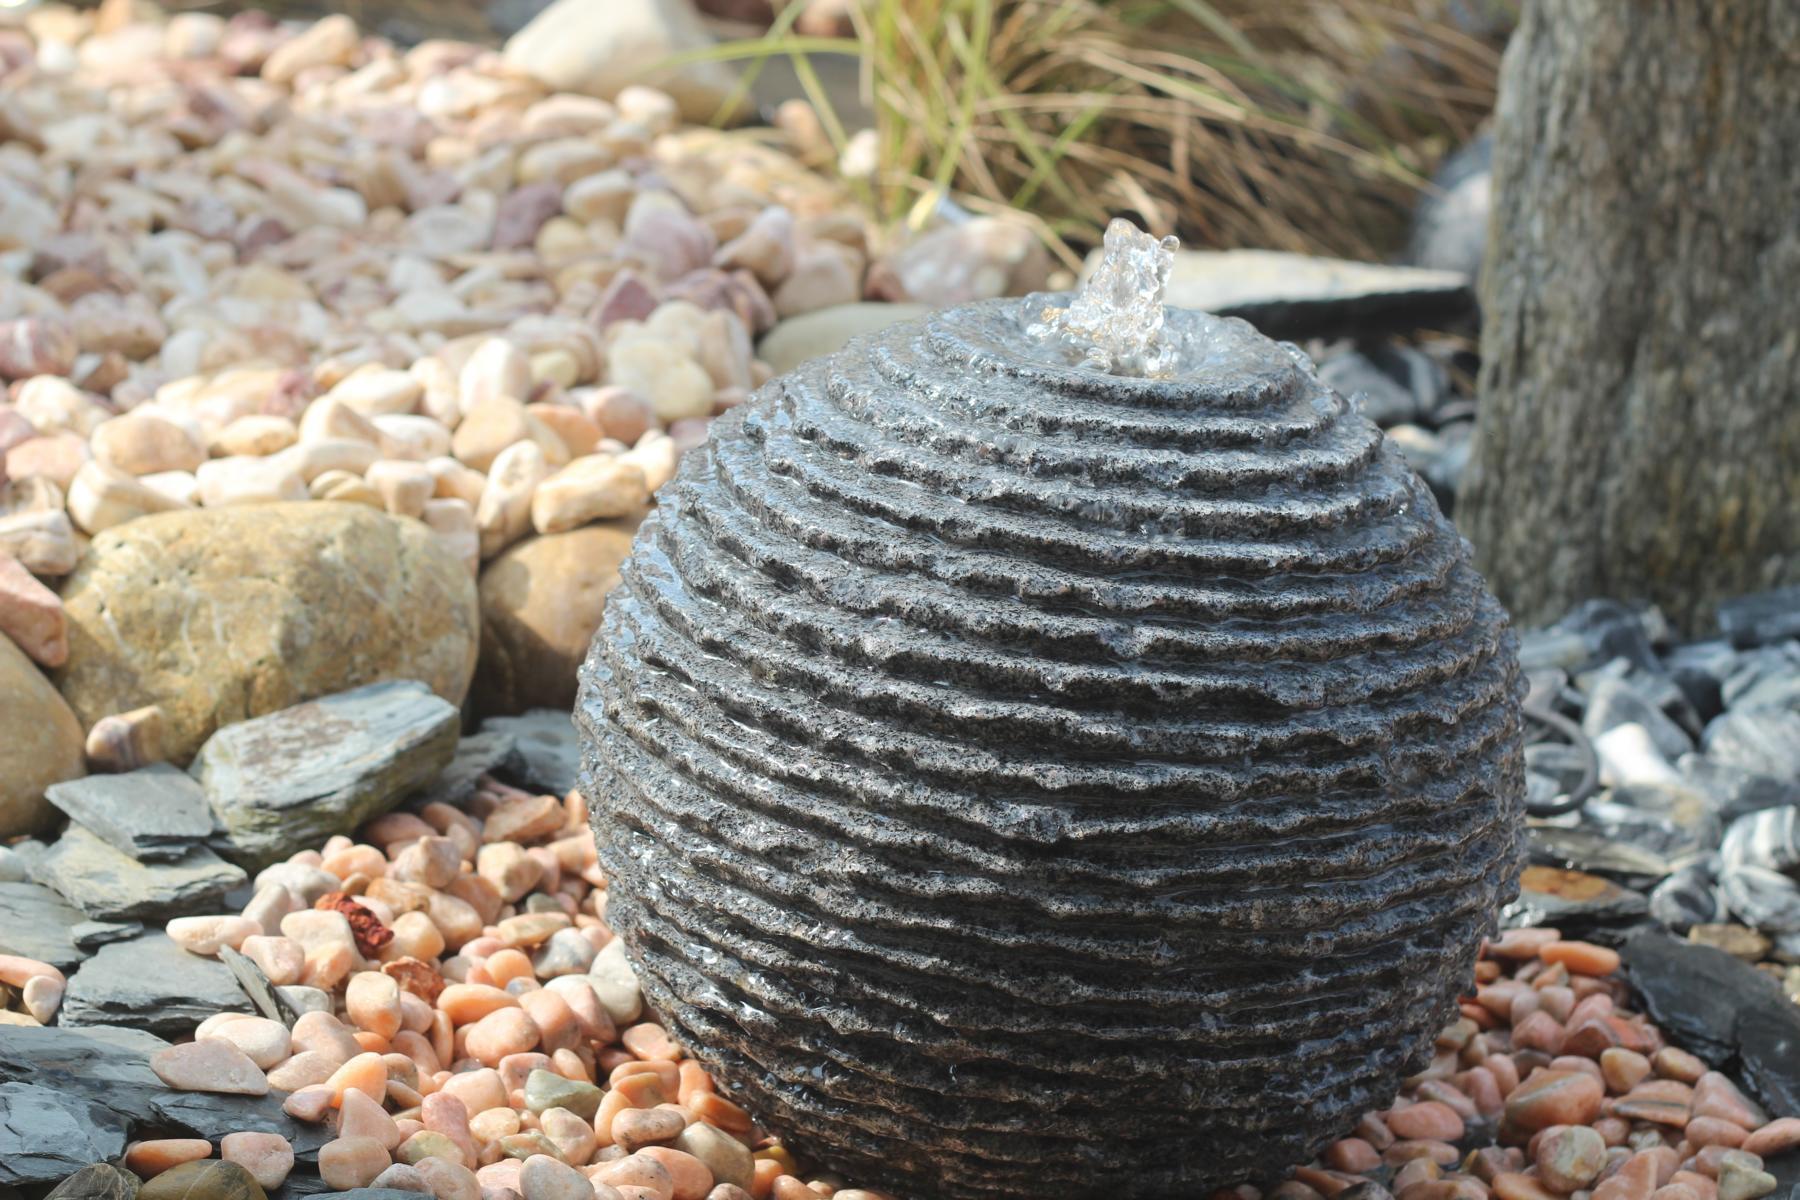 wasserspiel set quellstein granit kugel saturn 35 inkl becken pumpe springbrunnen 100200007. Black Bedroom Furniture Sets. Home Design Ideas